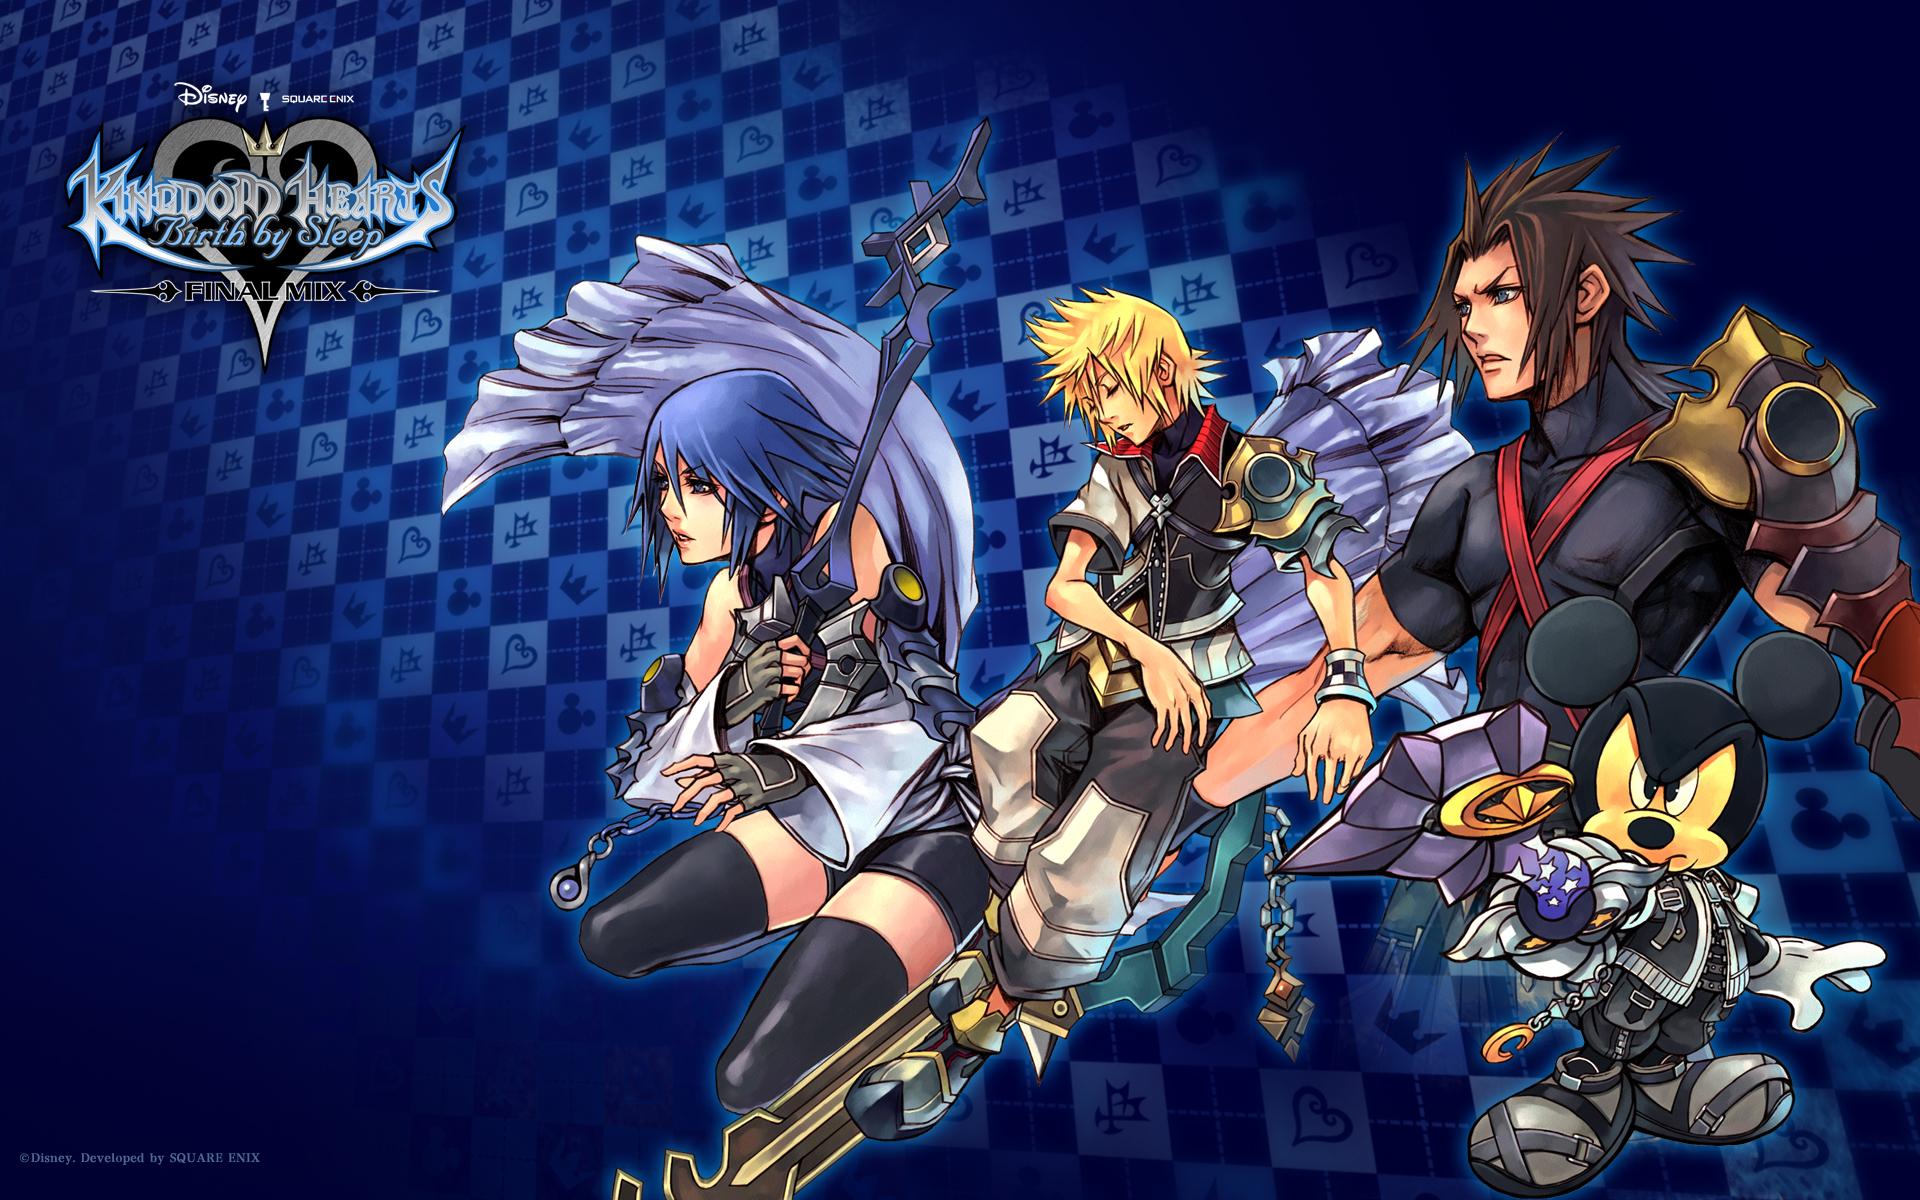 Wallpapers Birth By Sleep Kingdom Hearts Insider